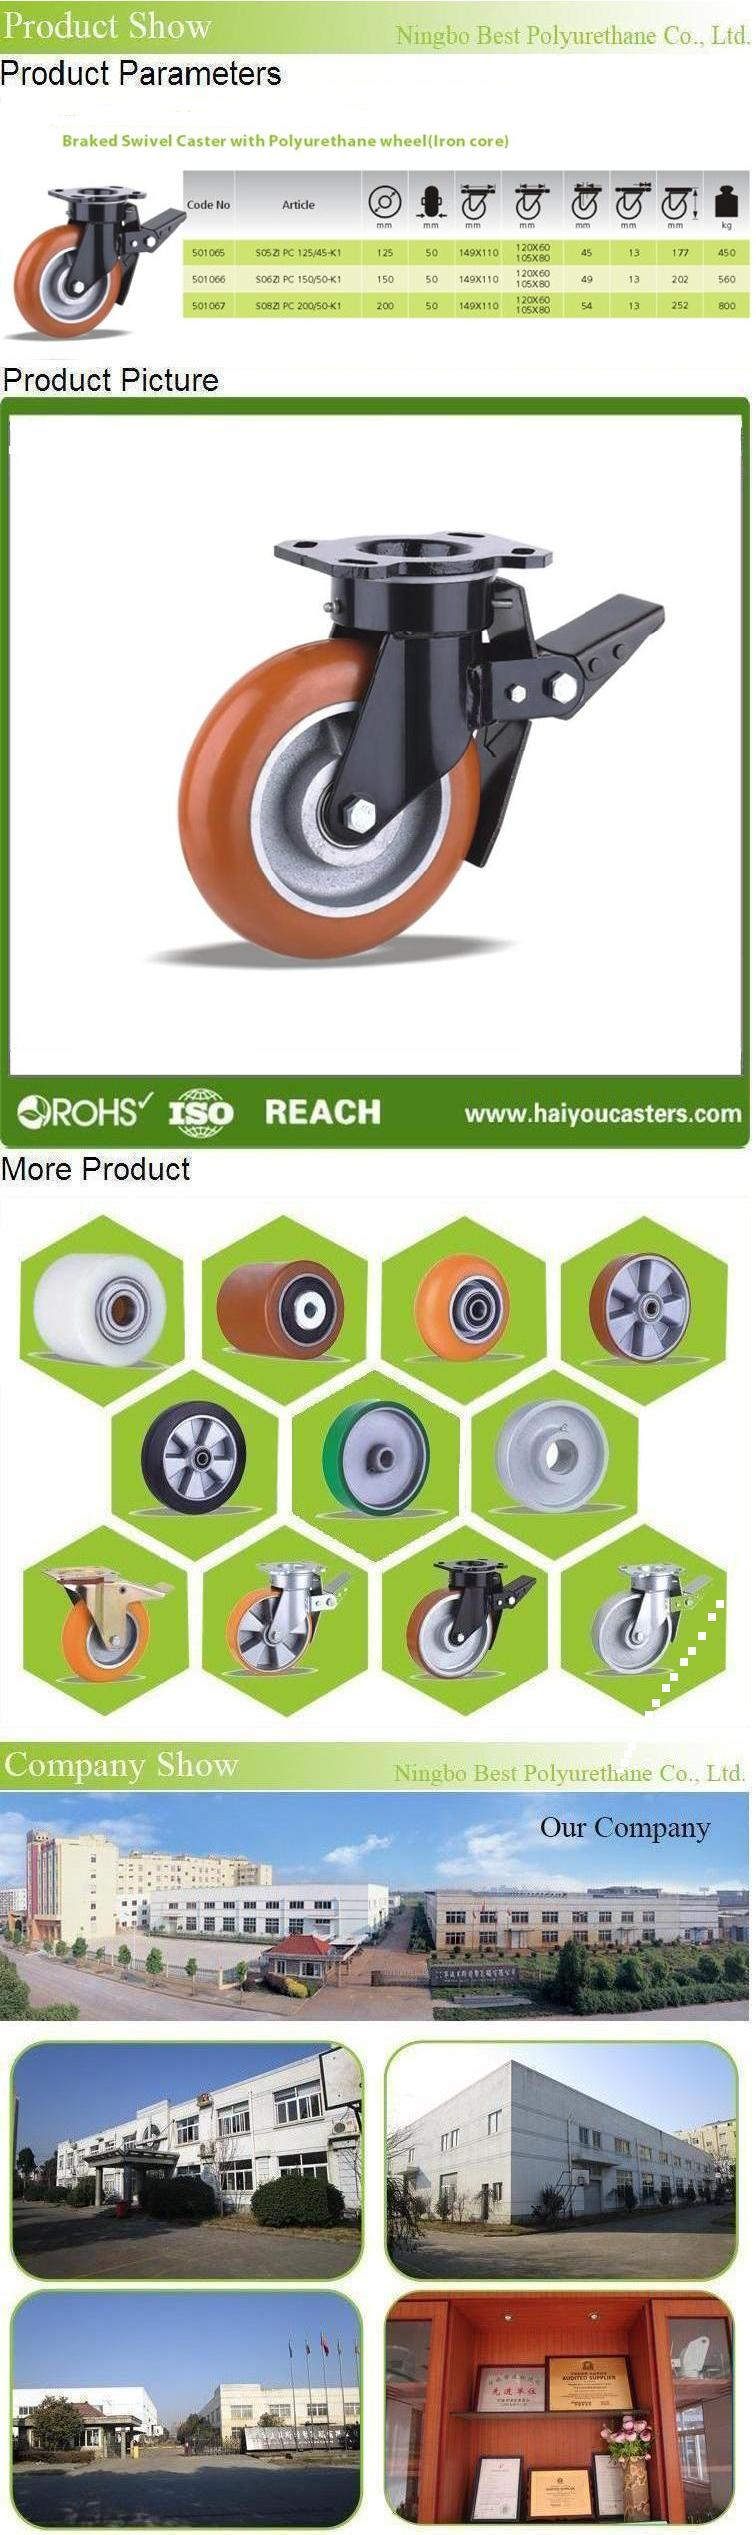 Swivel Caster With Polyurethane Wheel